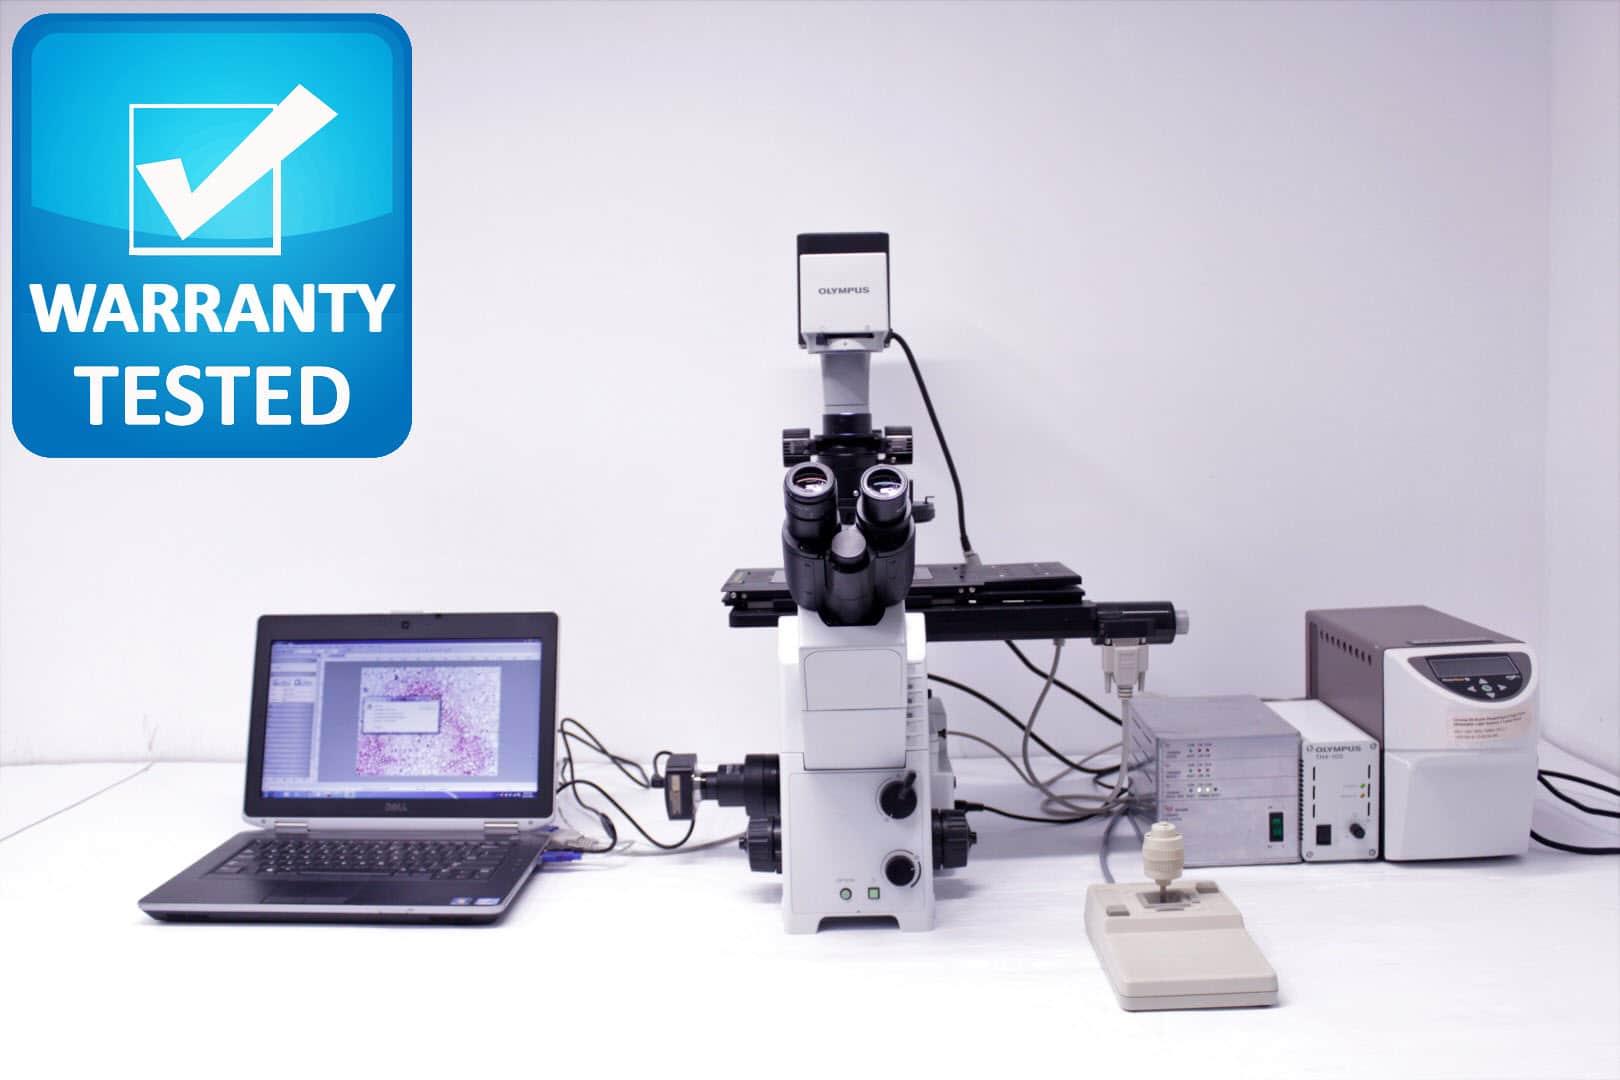 Olympus IX71 Inverted Fluorescence Motorized Microscope